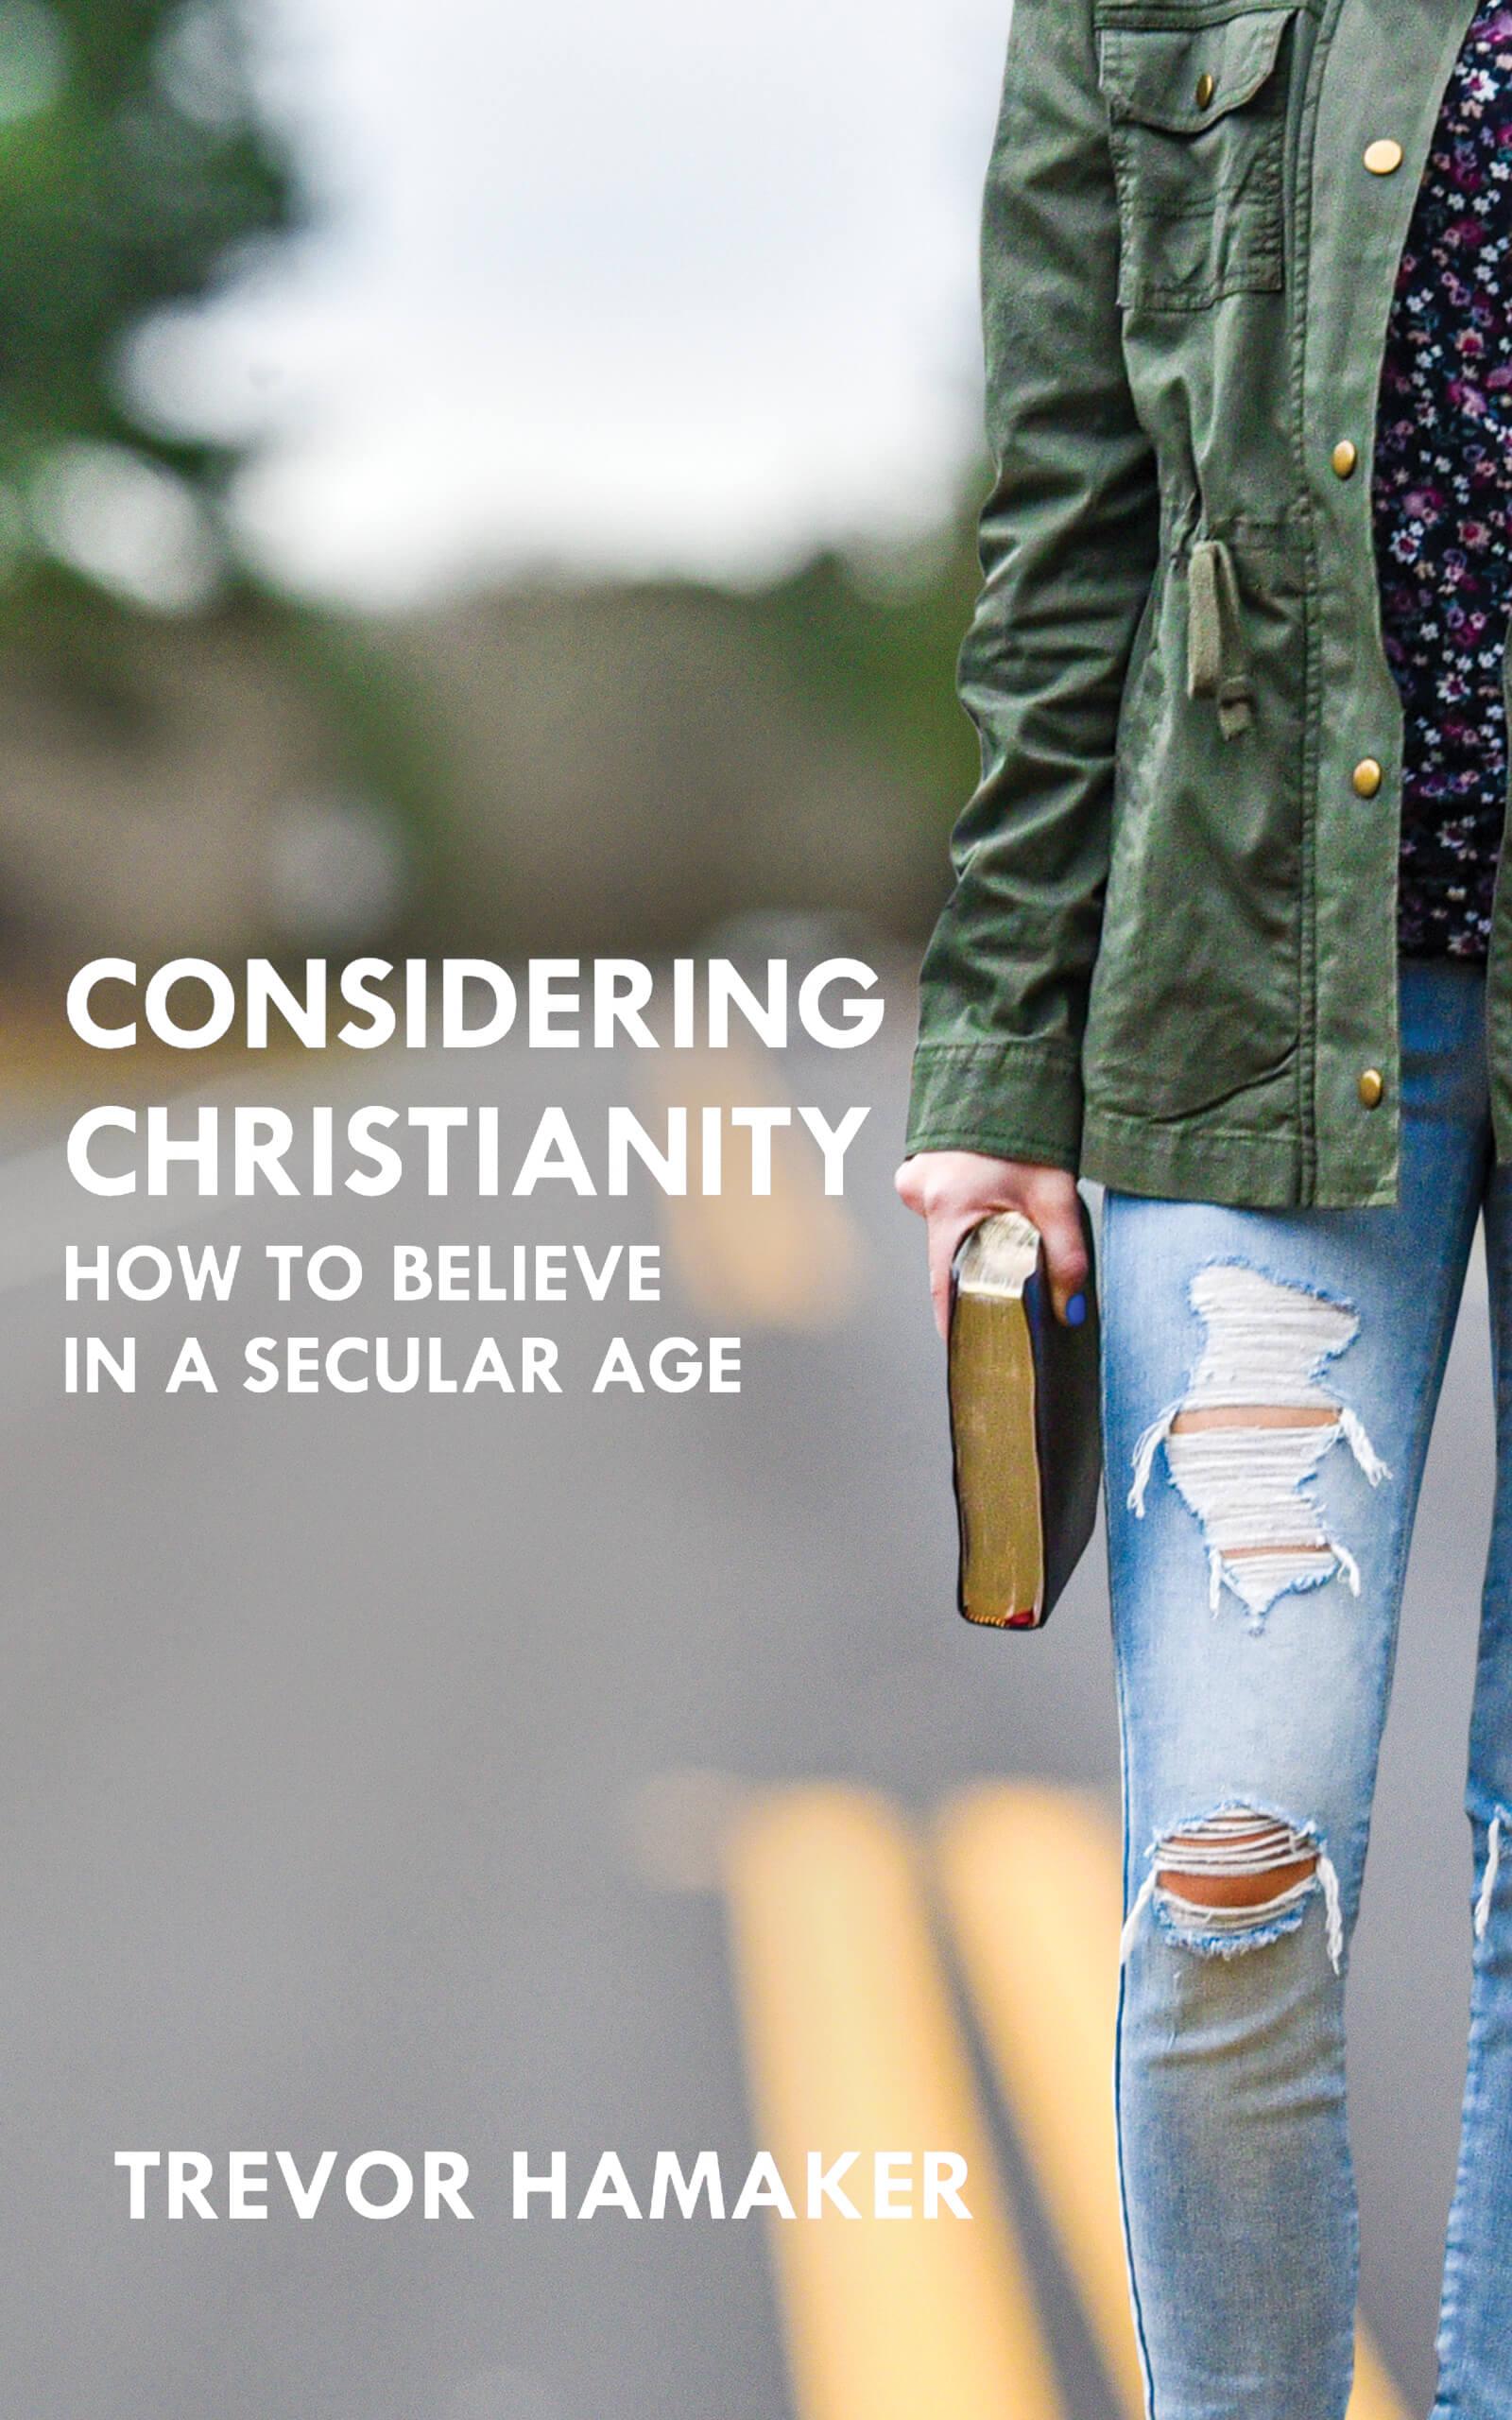 Considering Christianity by Trevor Hamaker